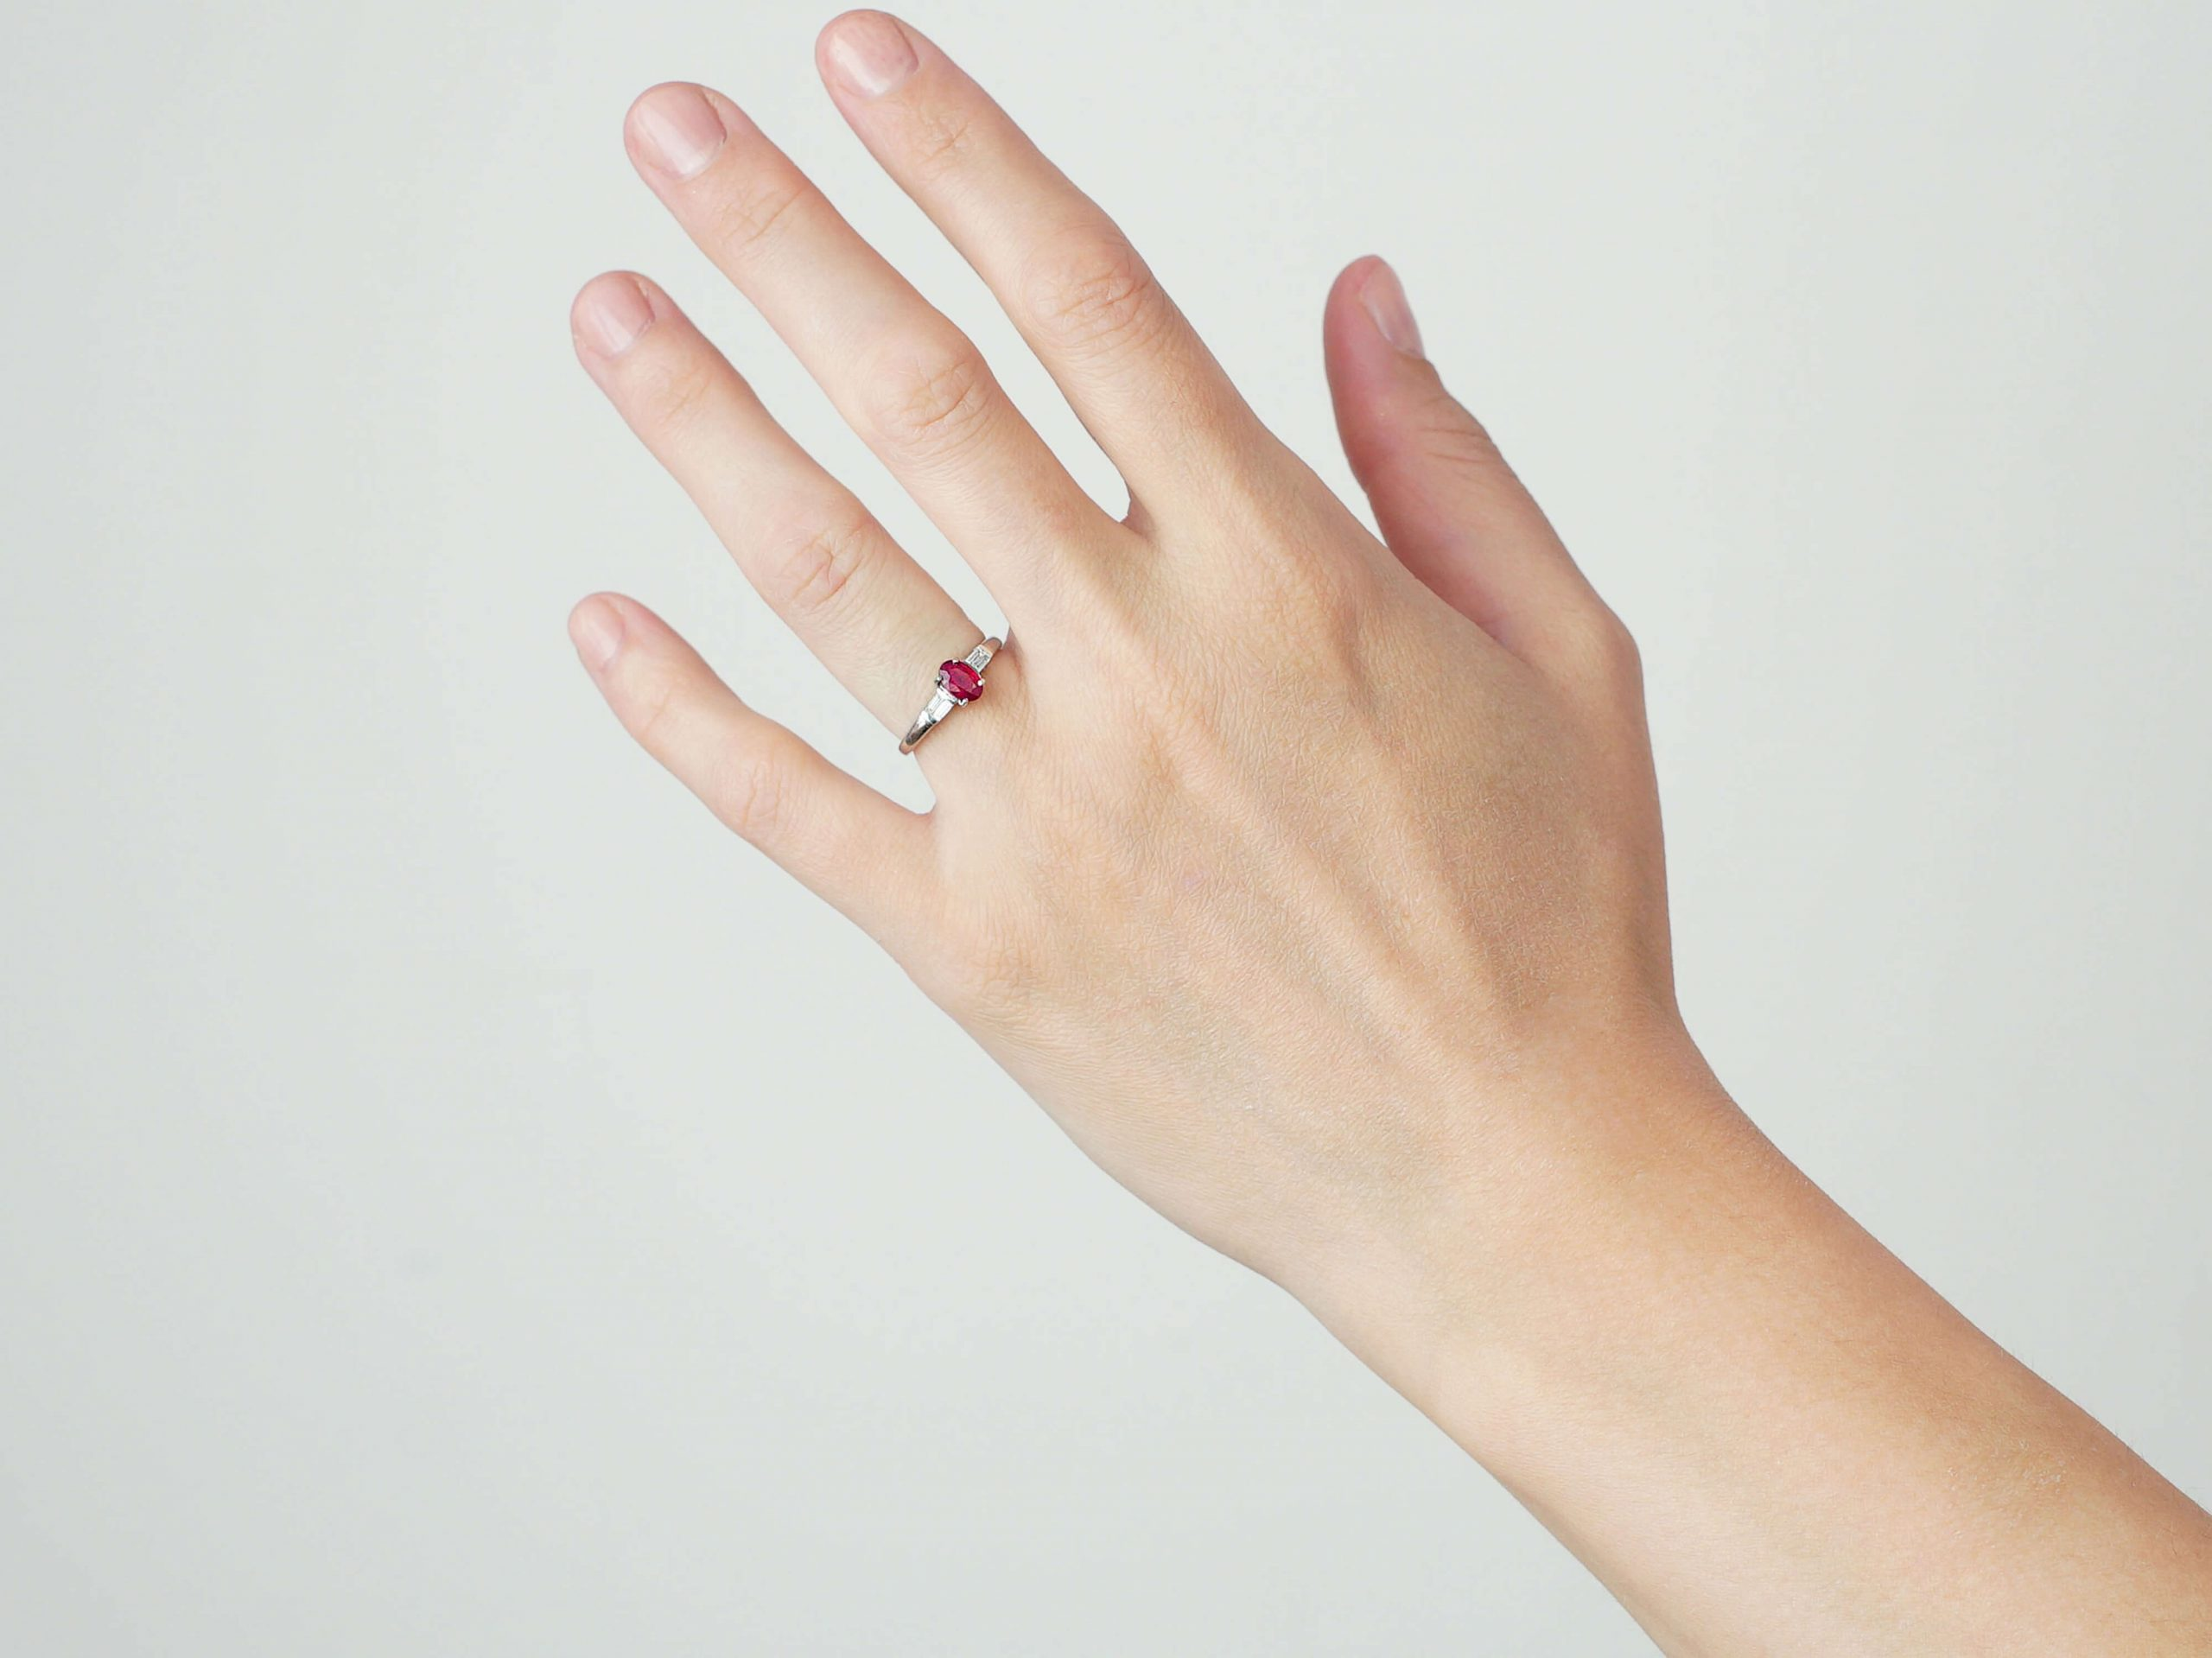 9ct White Gold, Ruby & Diamond Baguette Ring